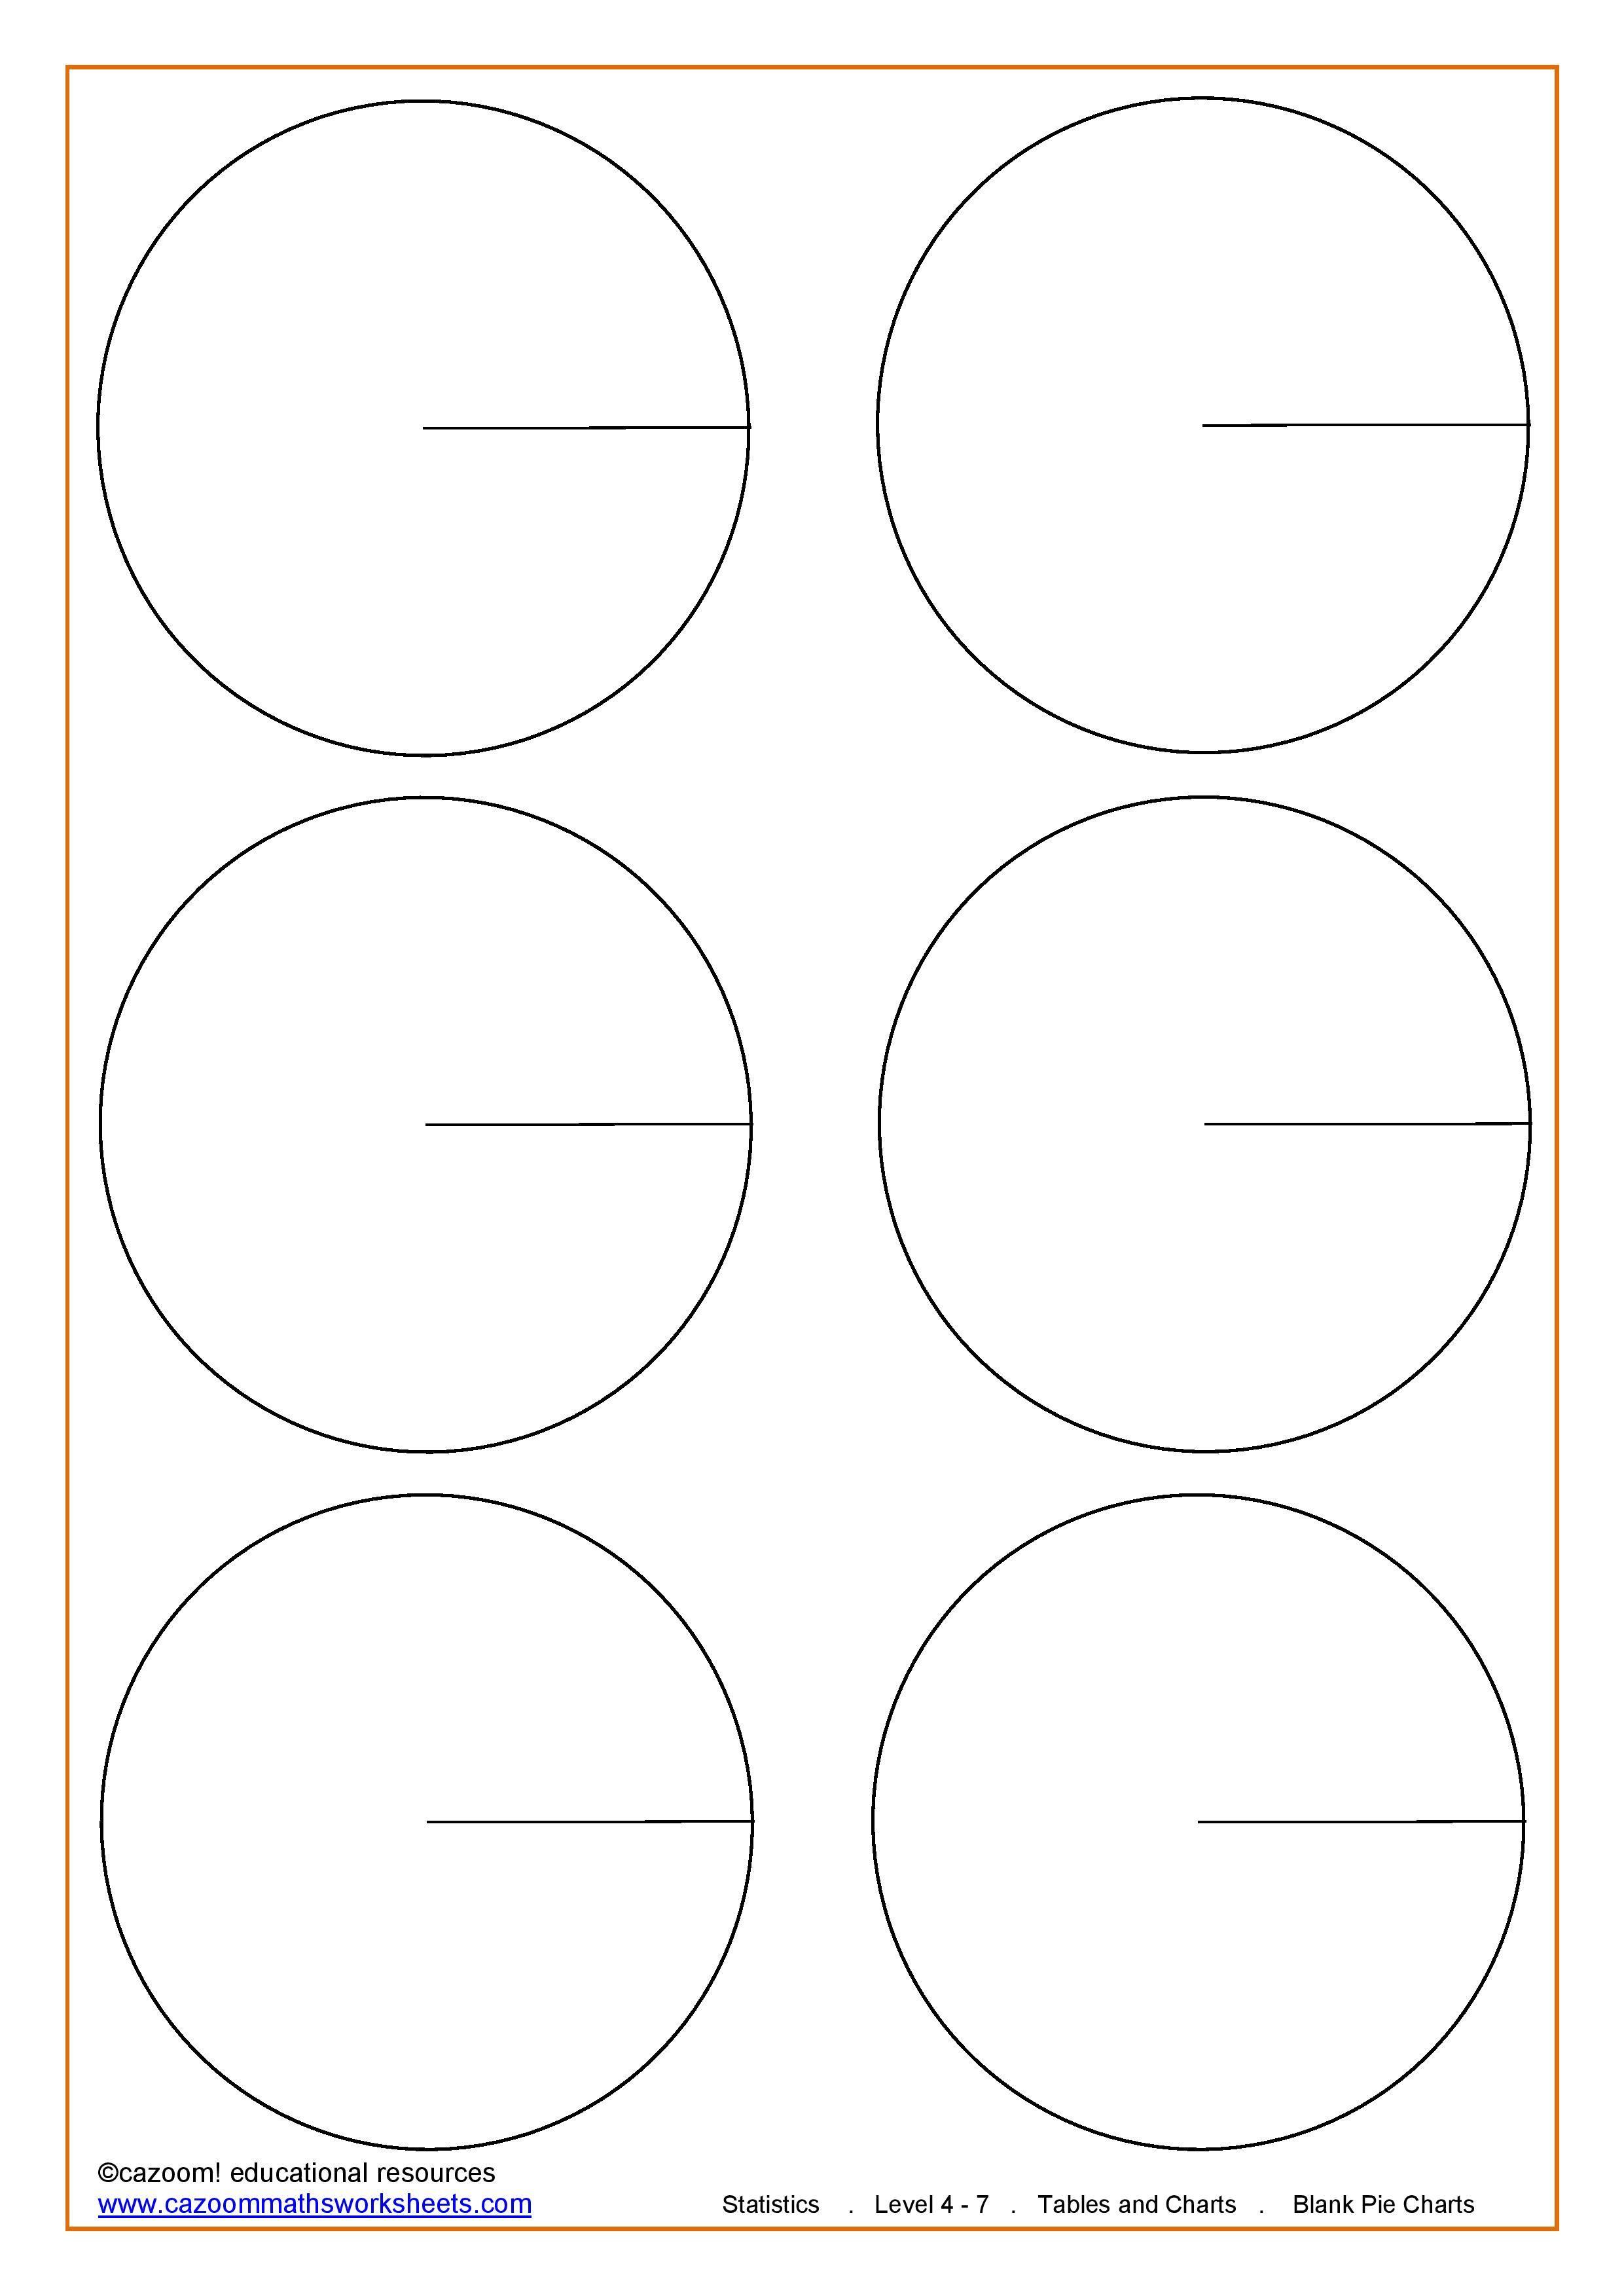 pie chart template worksheet - The future [ 3507 x 2481 Pixel ]